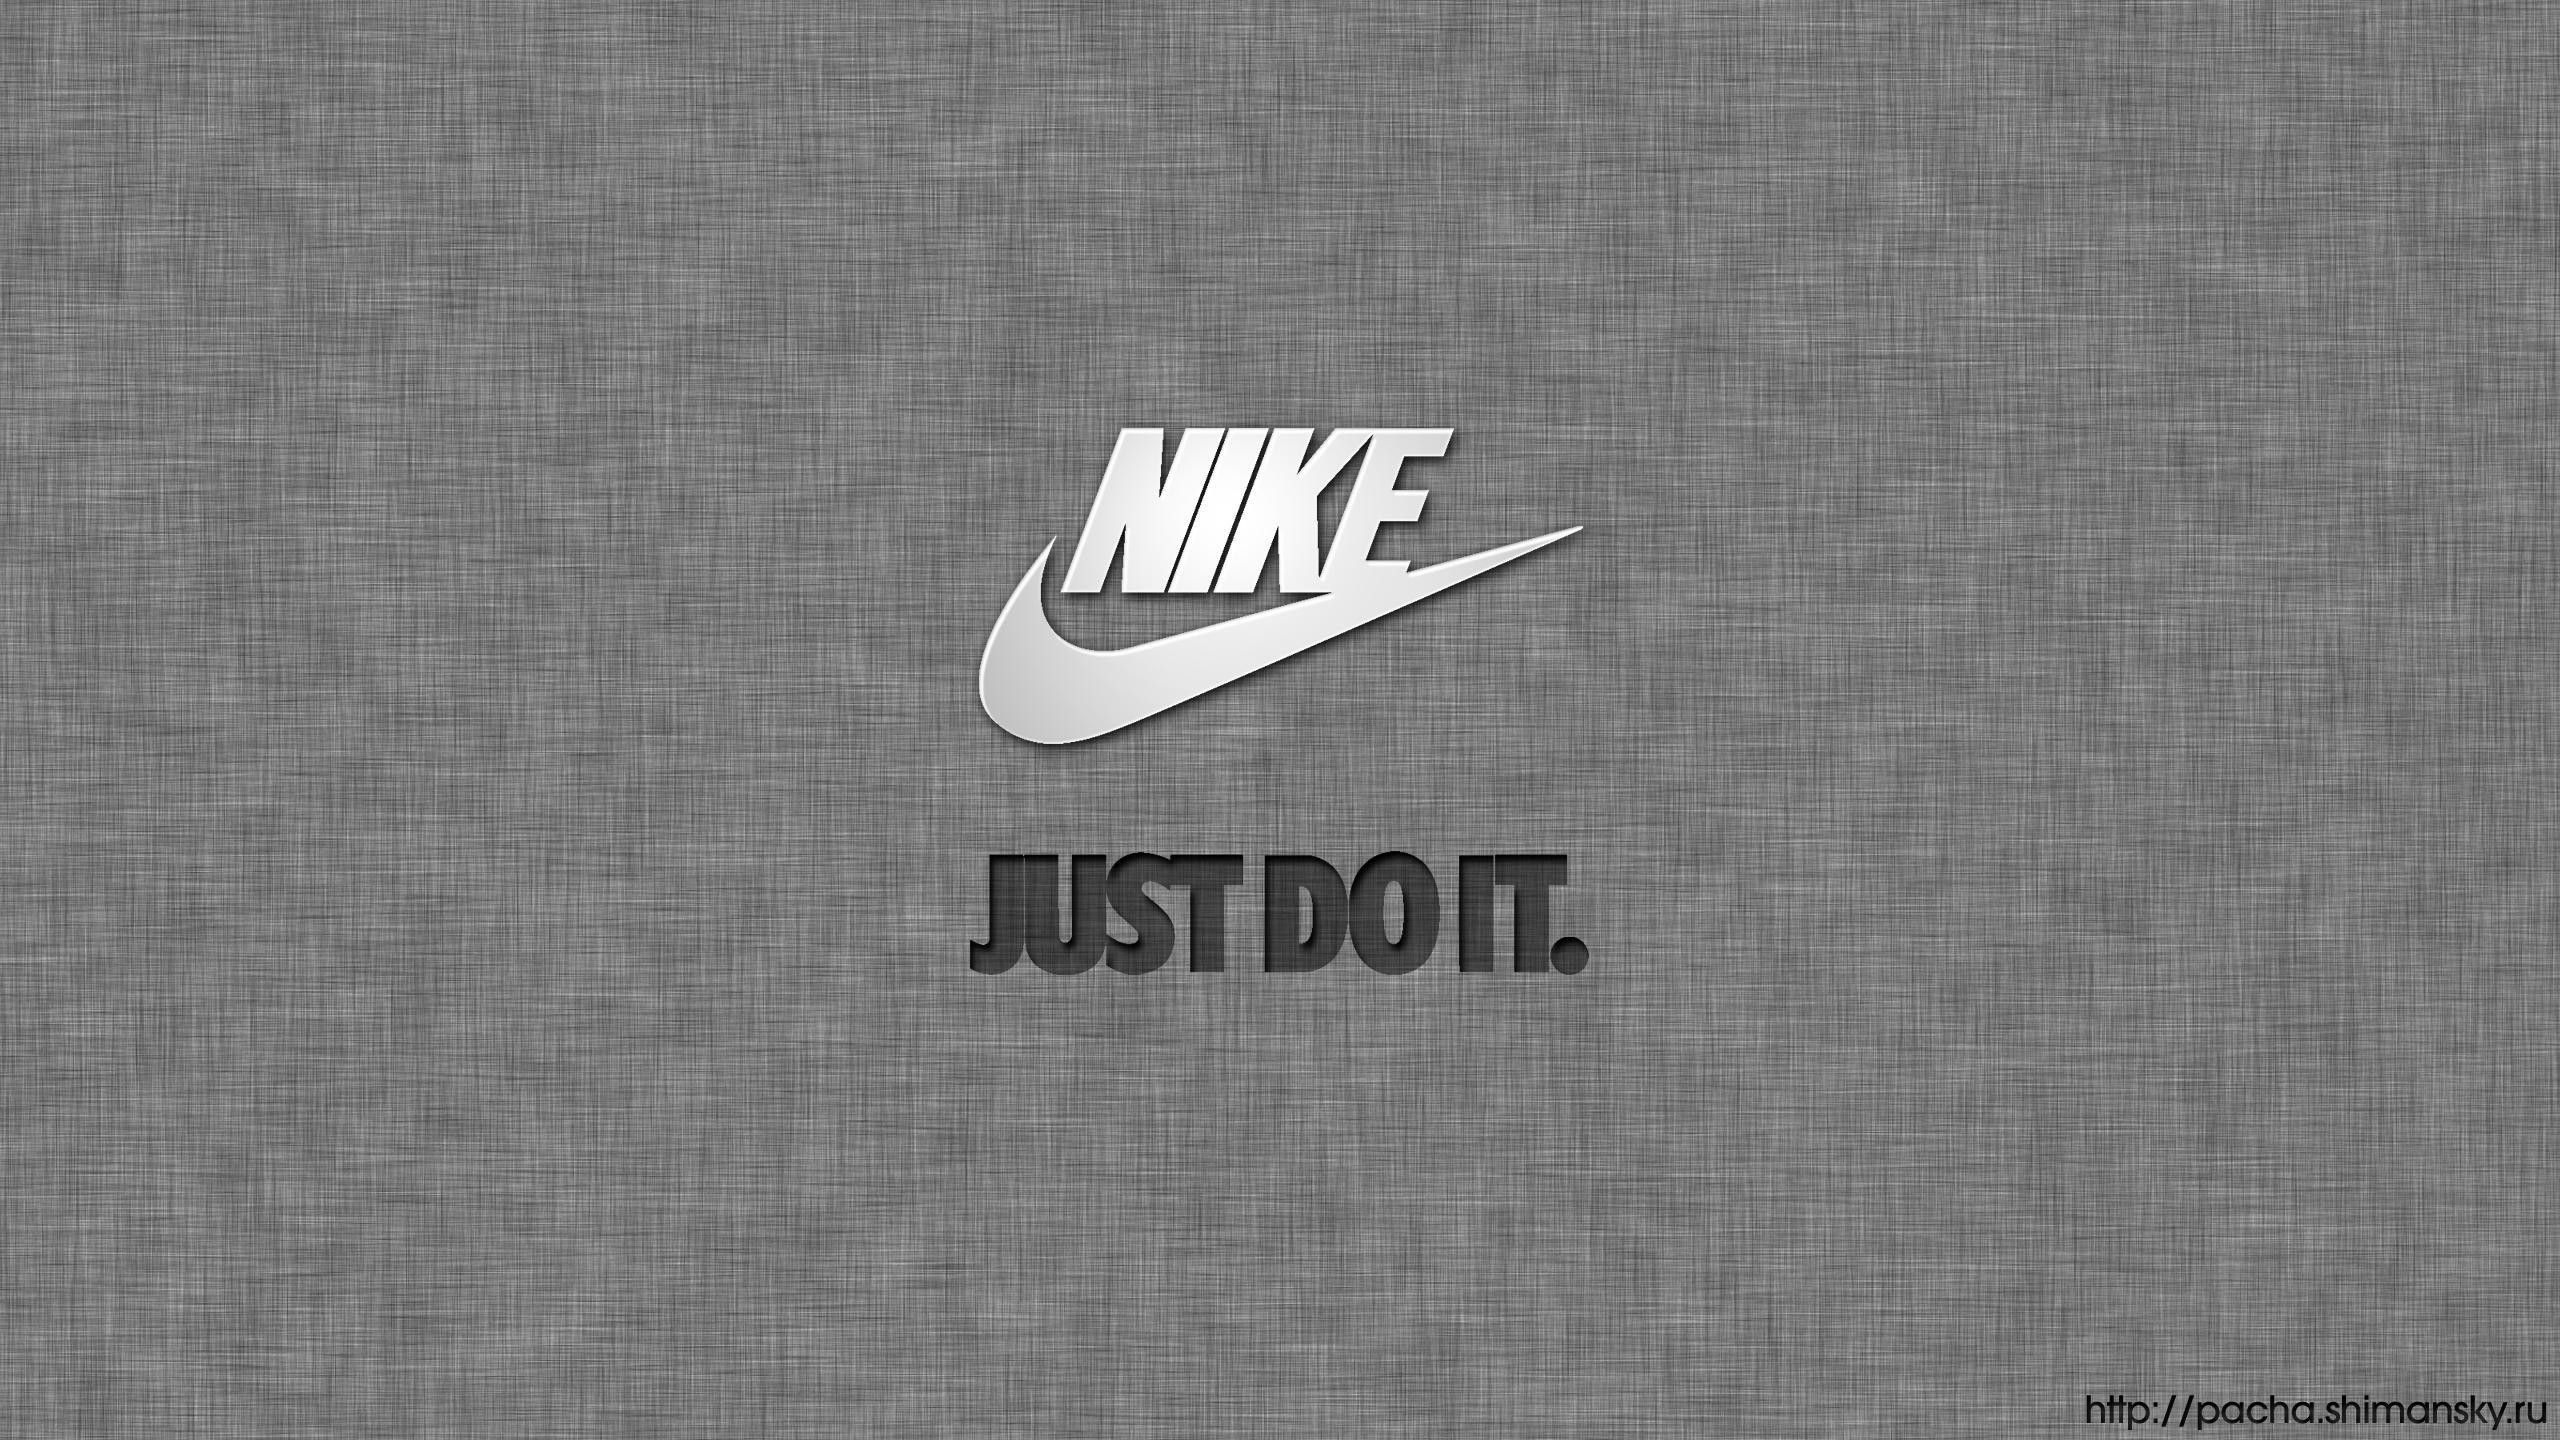 Nike Wallpaper (150 Wallpapers) HD Wallpapers 배경화면 및 배경